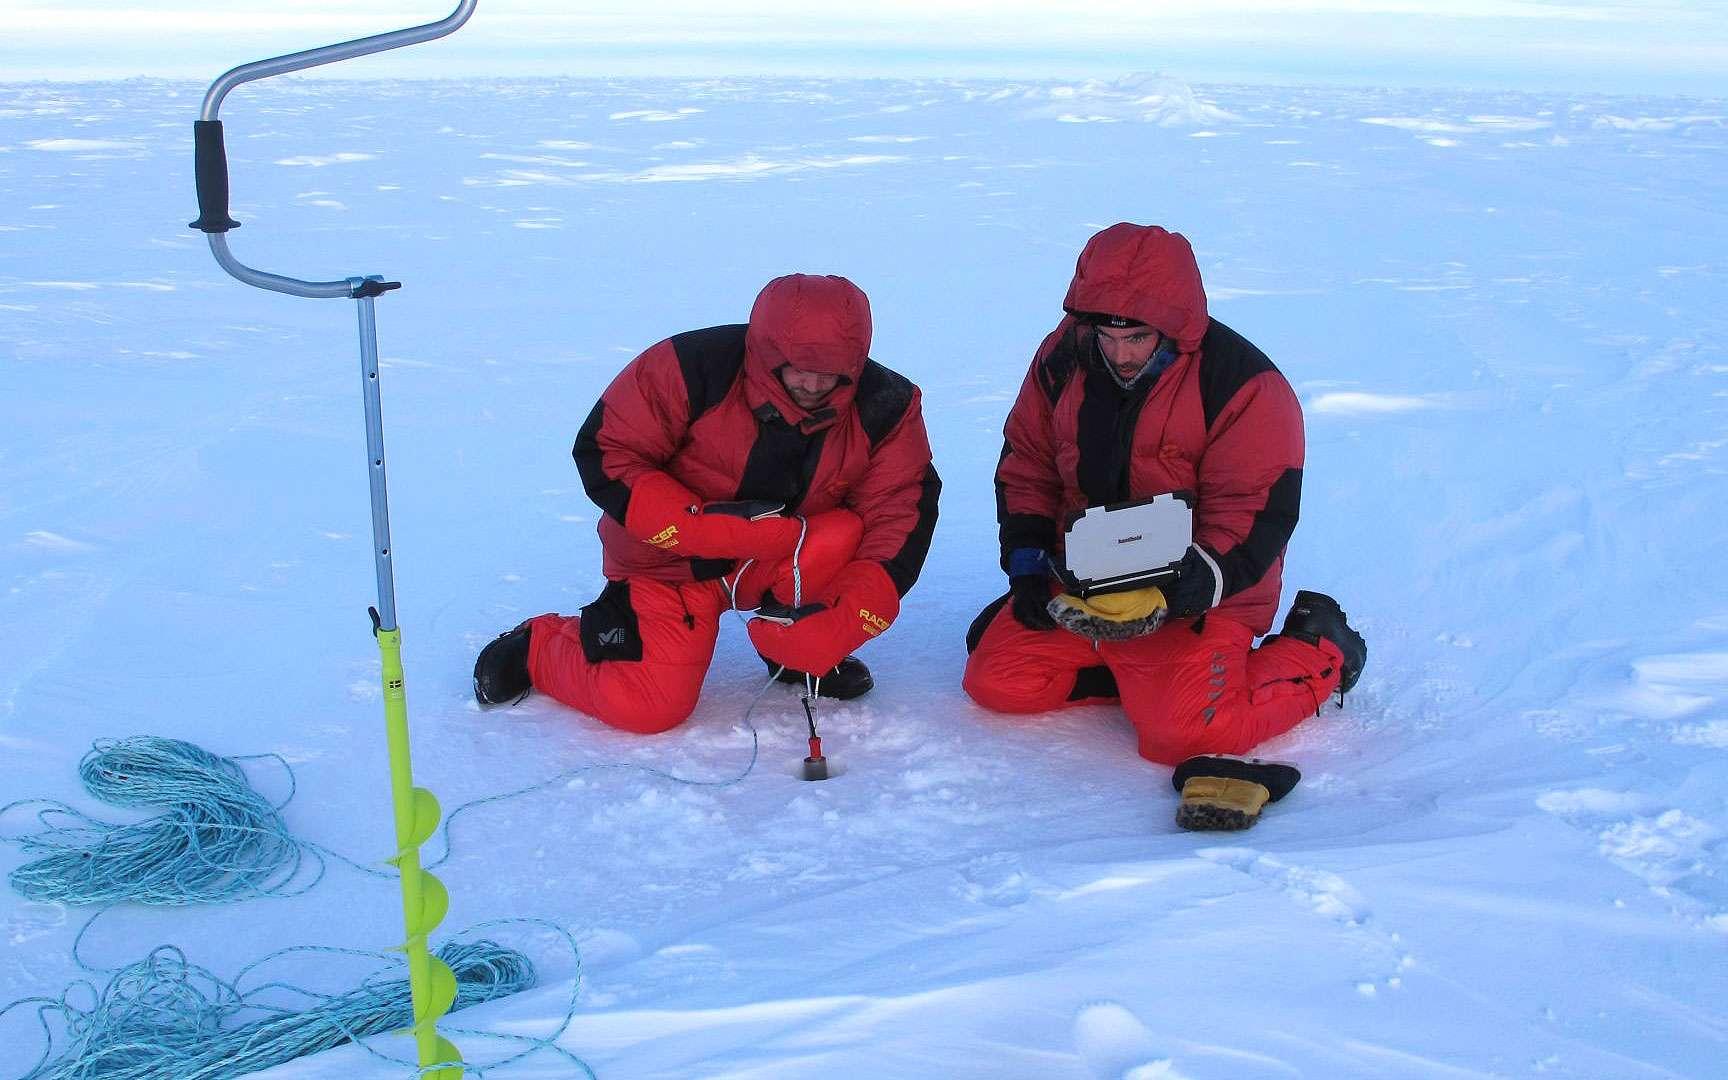 Quelques mesures. Prises de quelques mesures scientifiques. © PôleNord2012